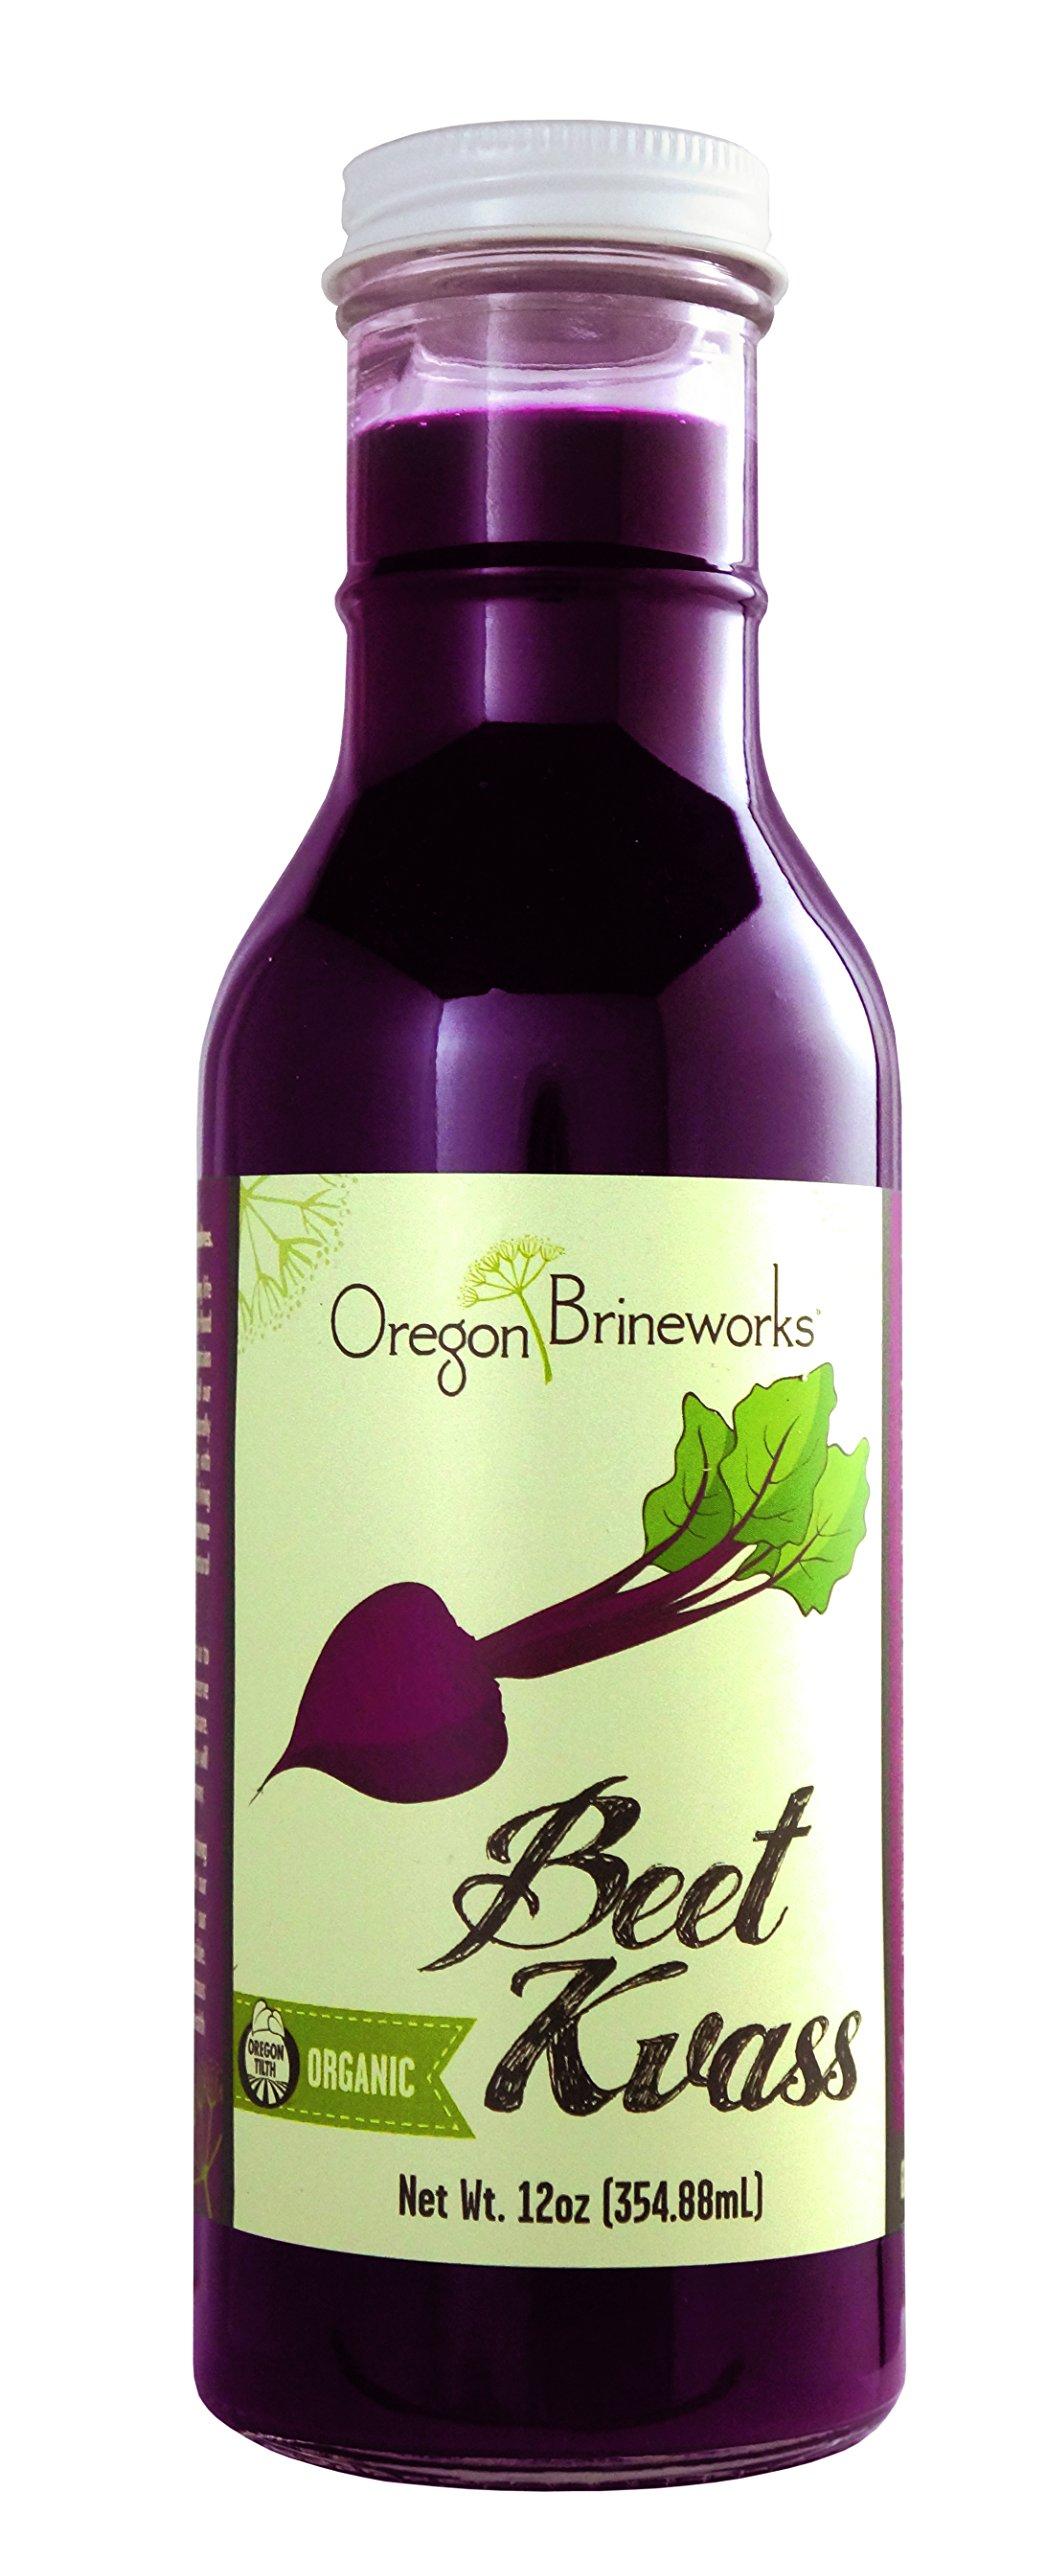 Beet Kvass, (6 Pack), Organic, Raw, Fermented, Probiotic, 12 Fl Oz by Oregon Brineworks